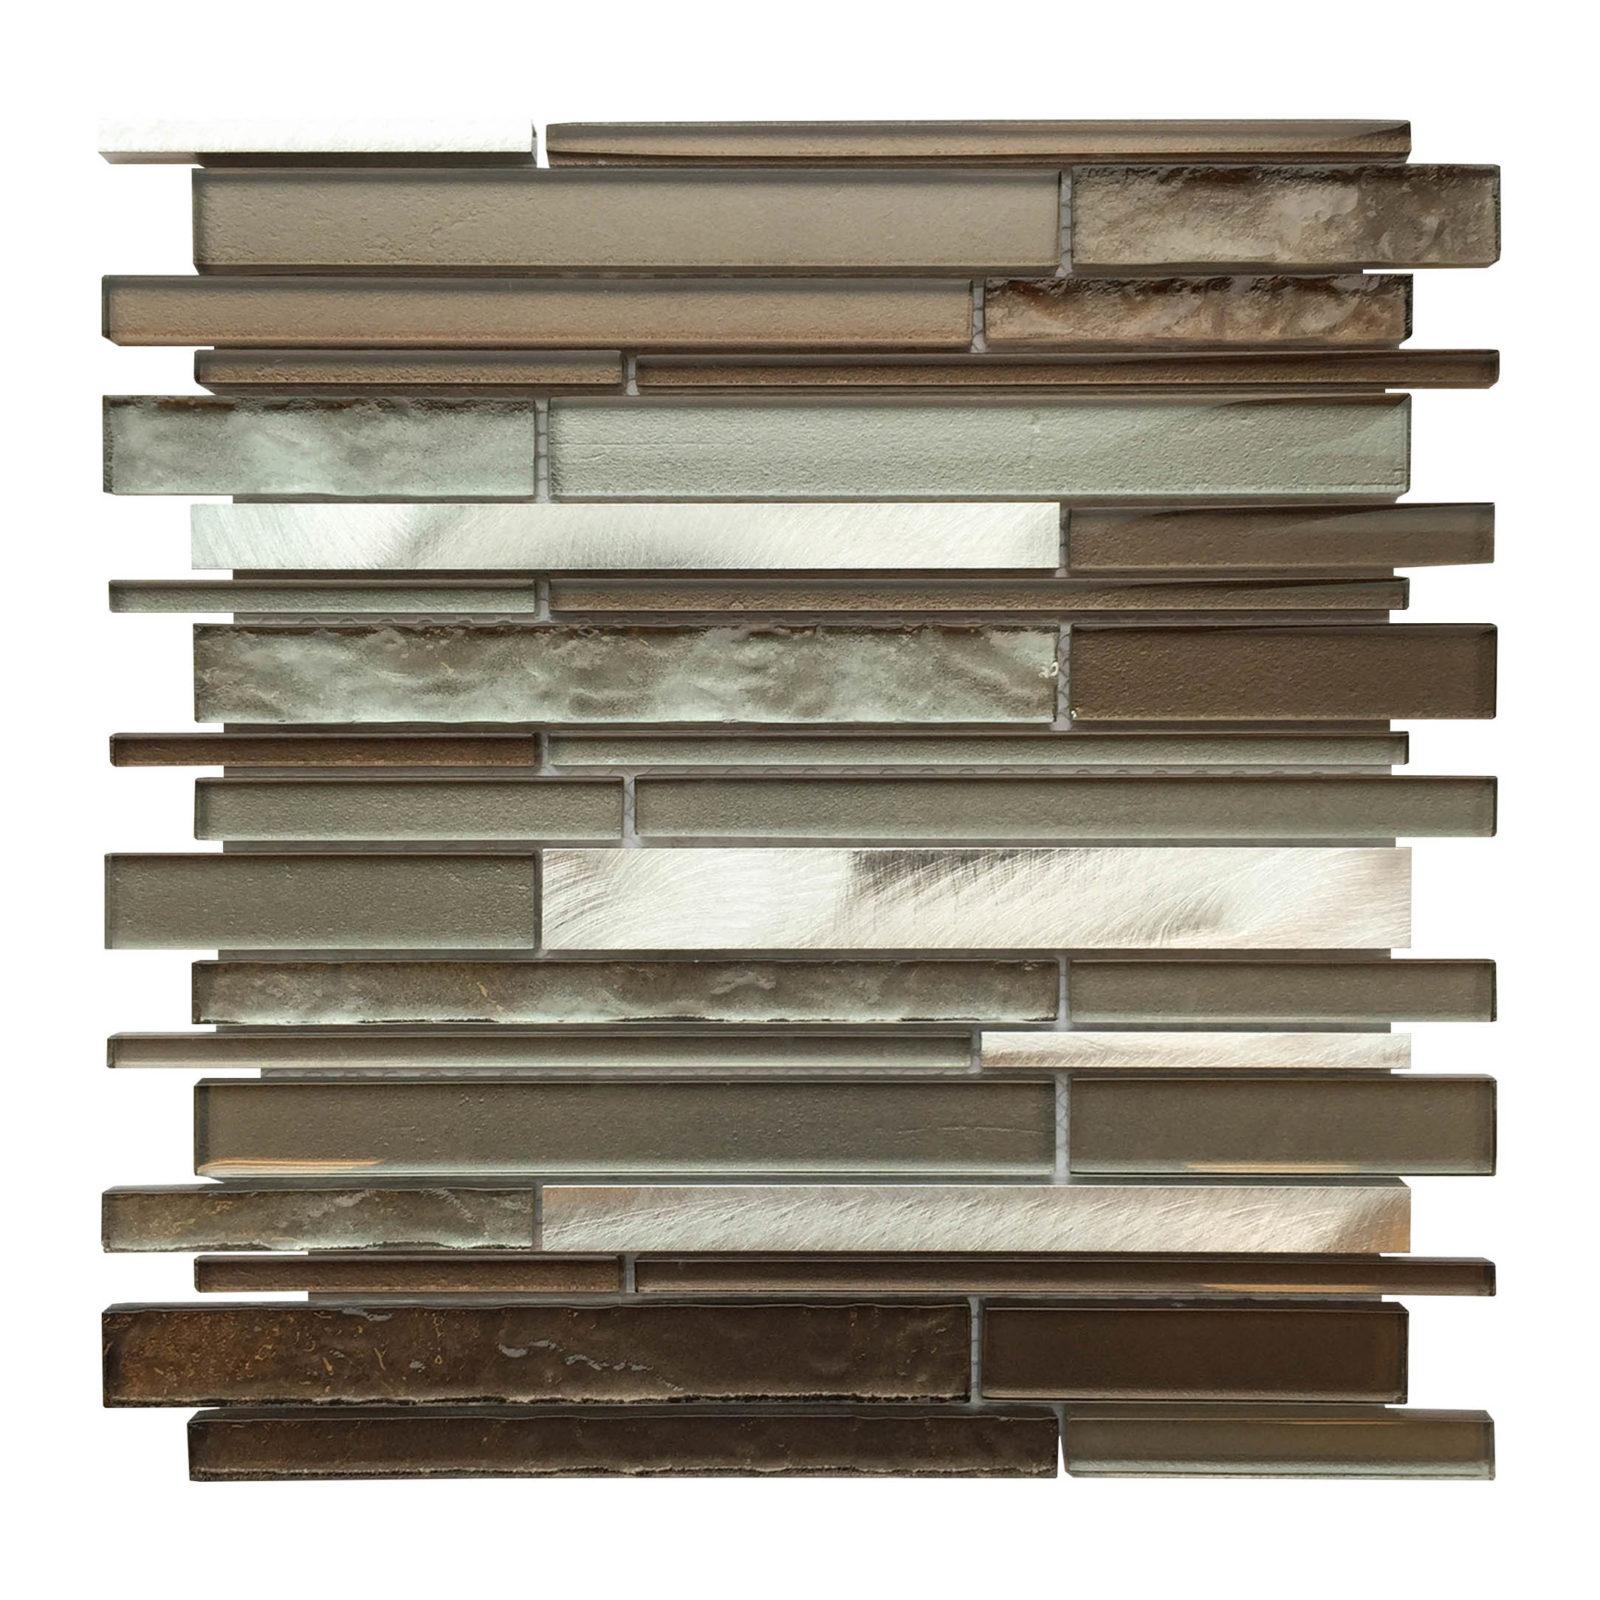 AL3300 Glass Tile and Stone, Strip Mosaic Backsplash